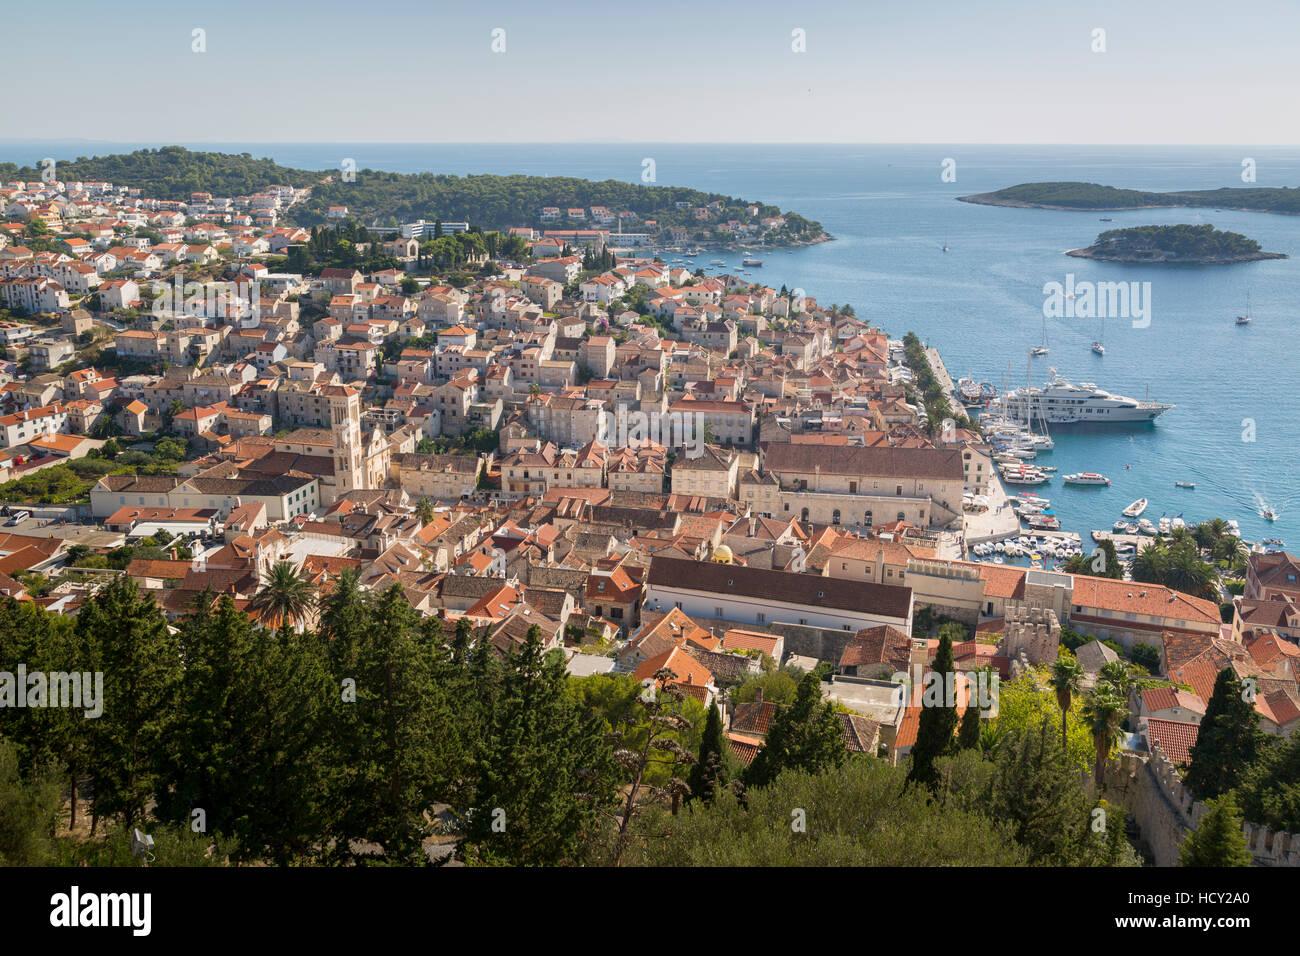 Blick auf Hvar aus spanischen Festung, Insel Hvar, Dalmatien, Kroatien Stockbild